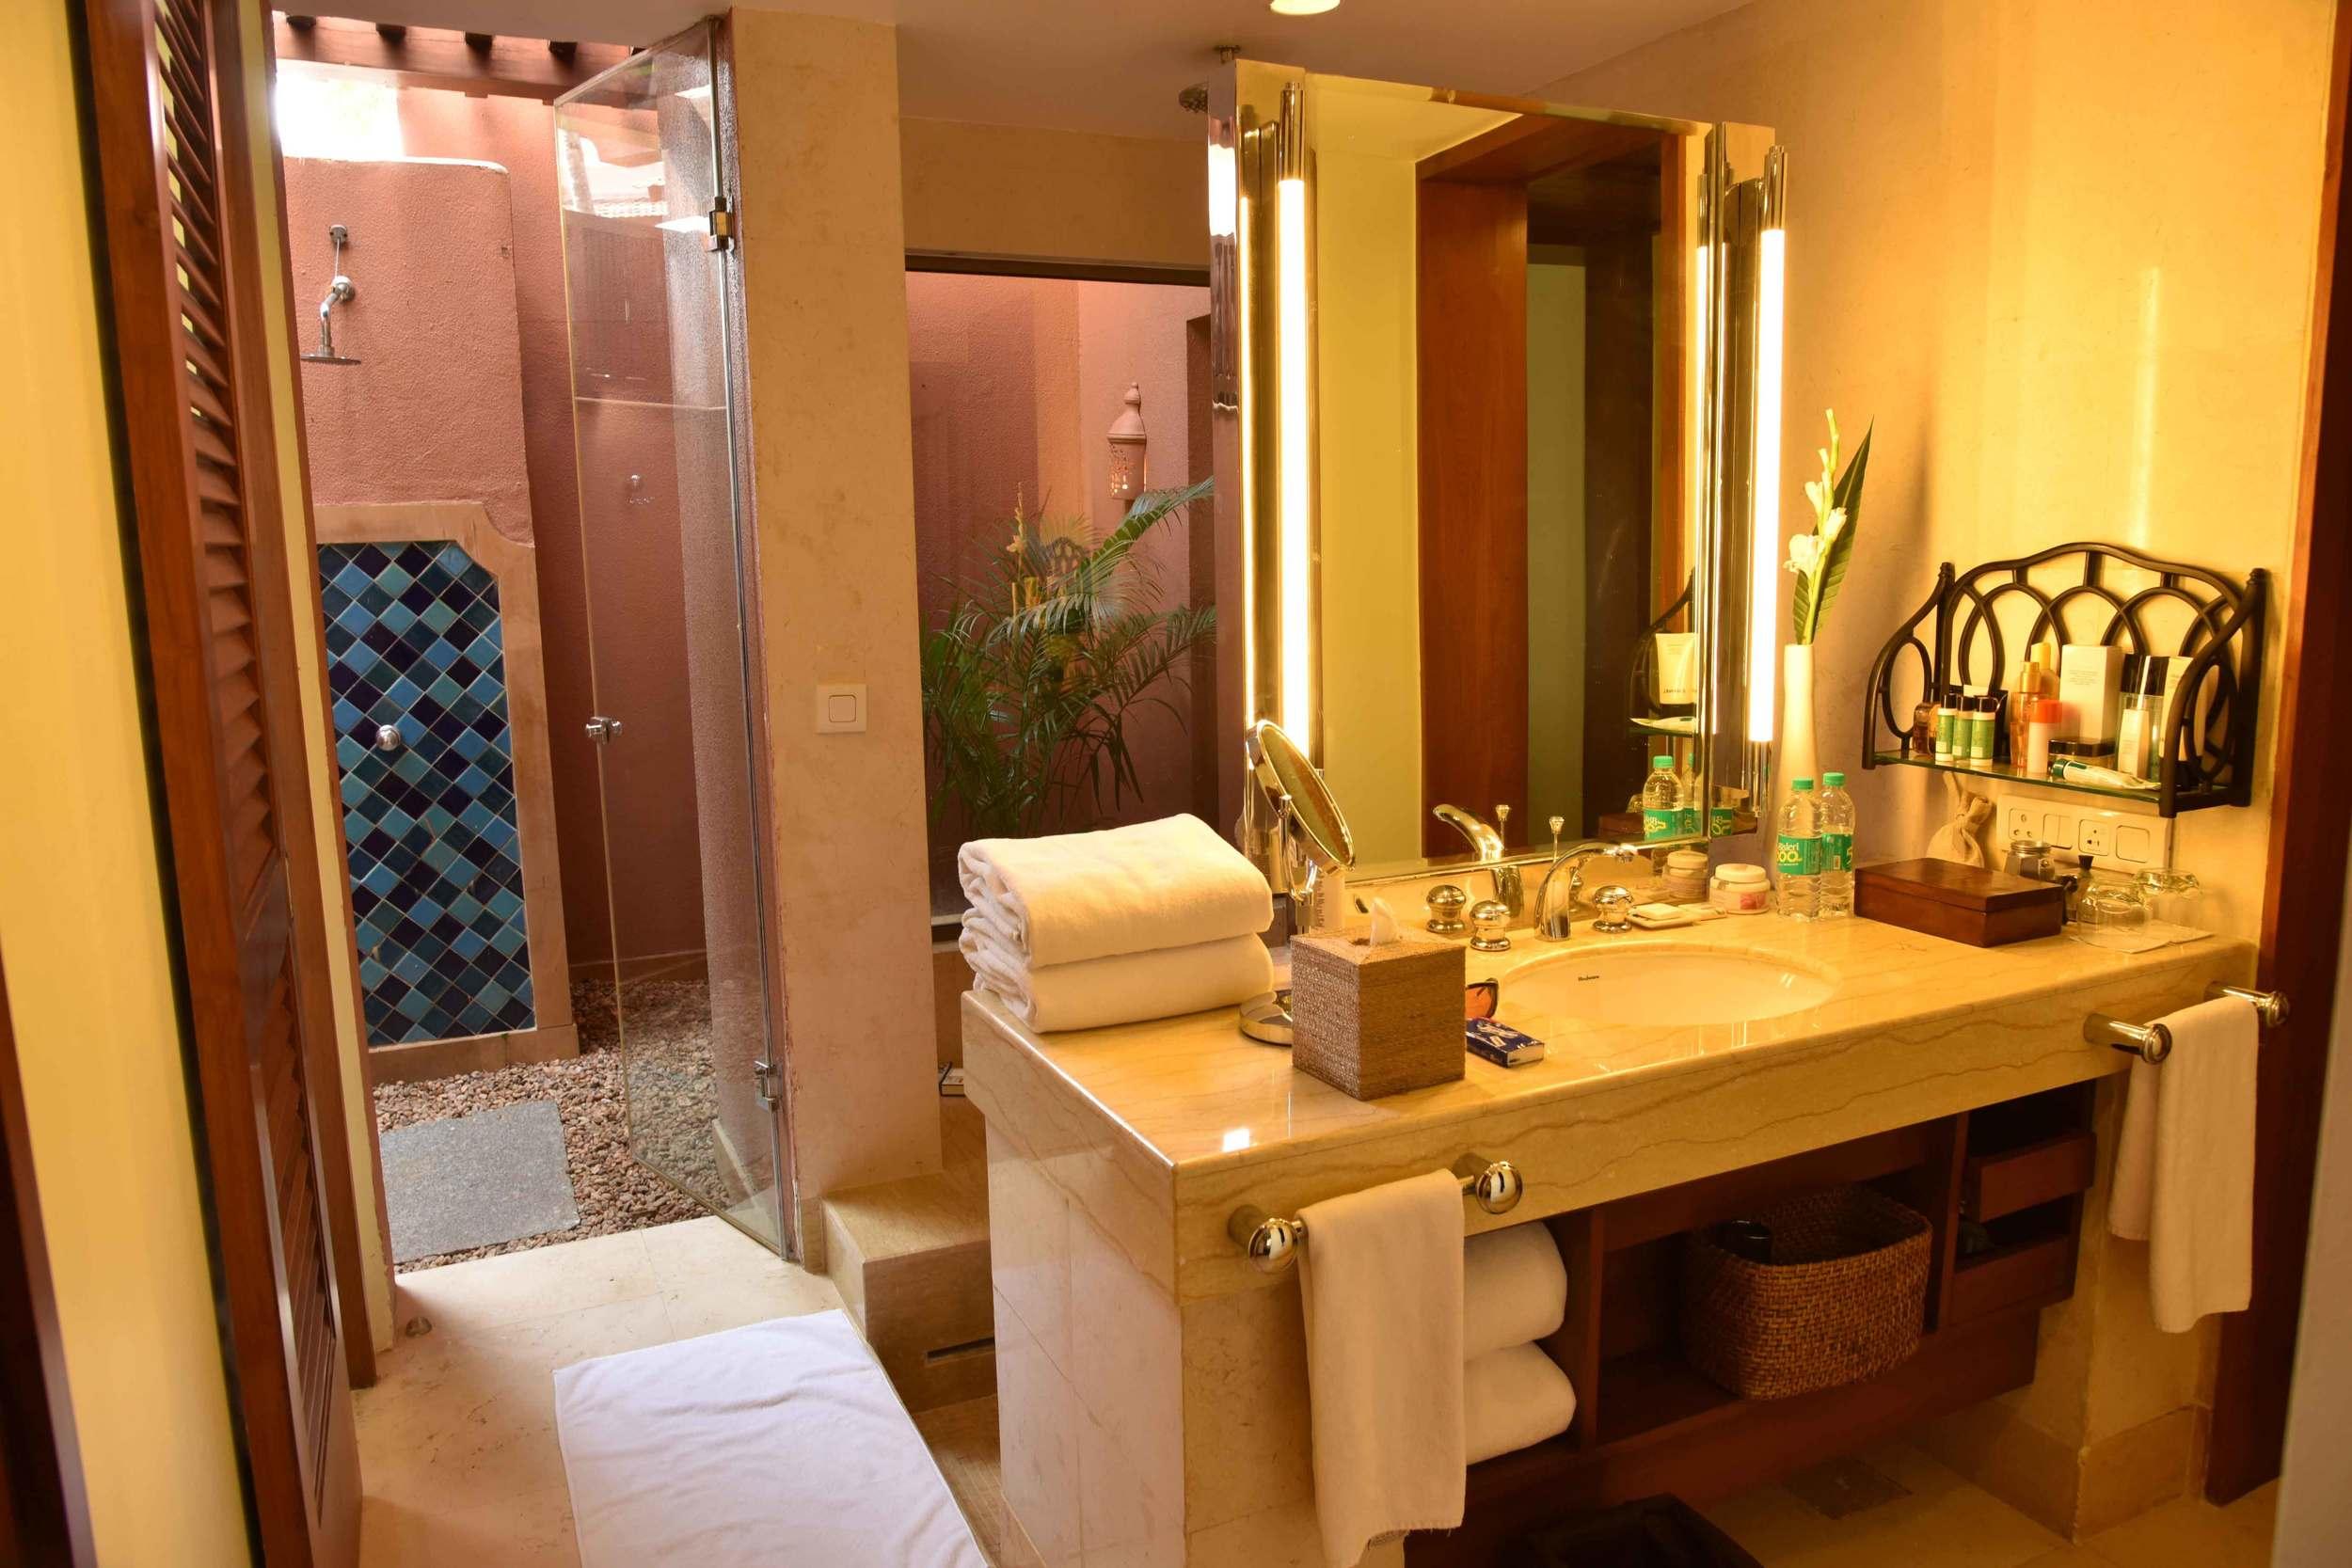 Spa inspired bathroom,Park Hyatt, Goa, India, beach resort, luxury spa resort. Image©thingstodot.com